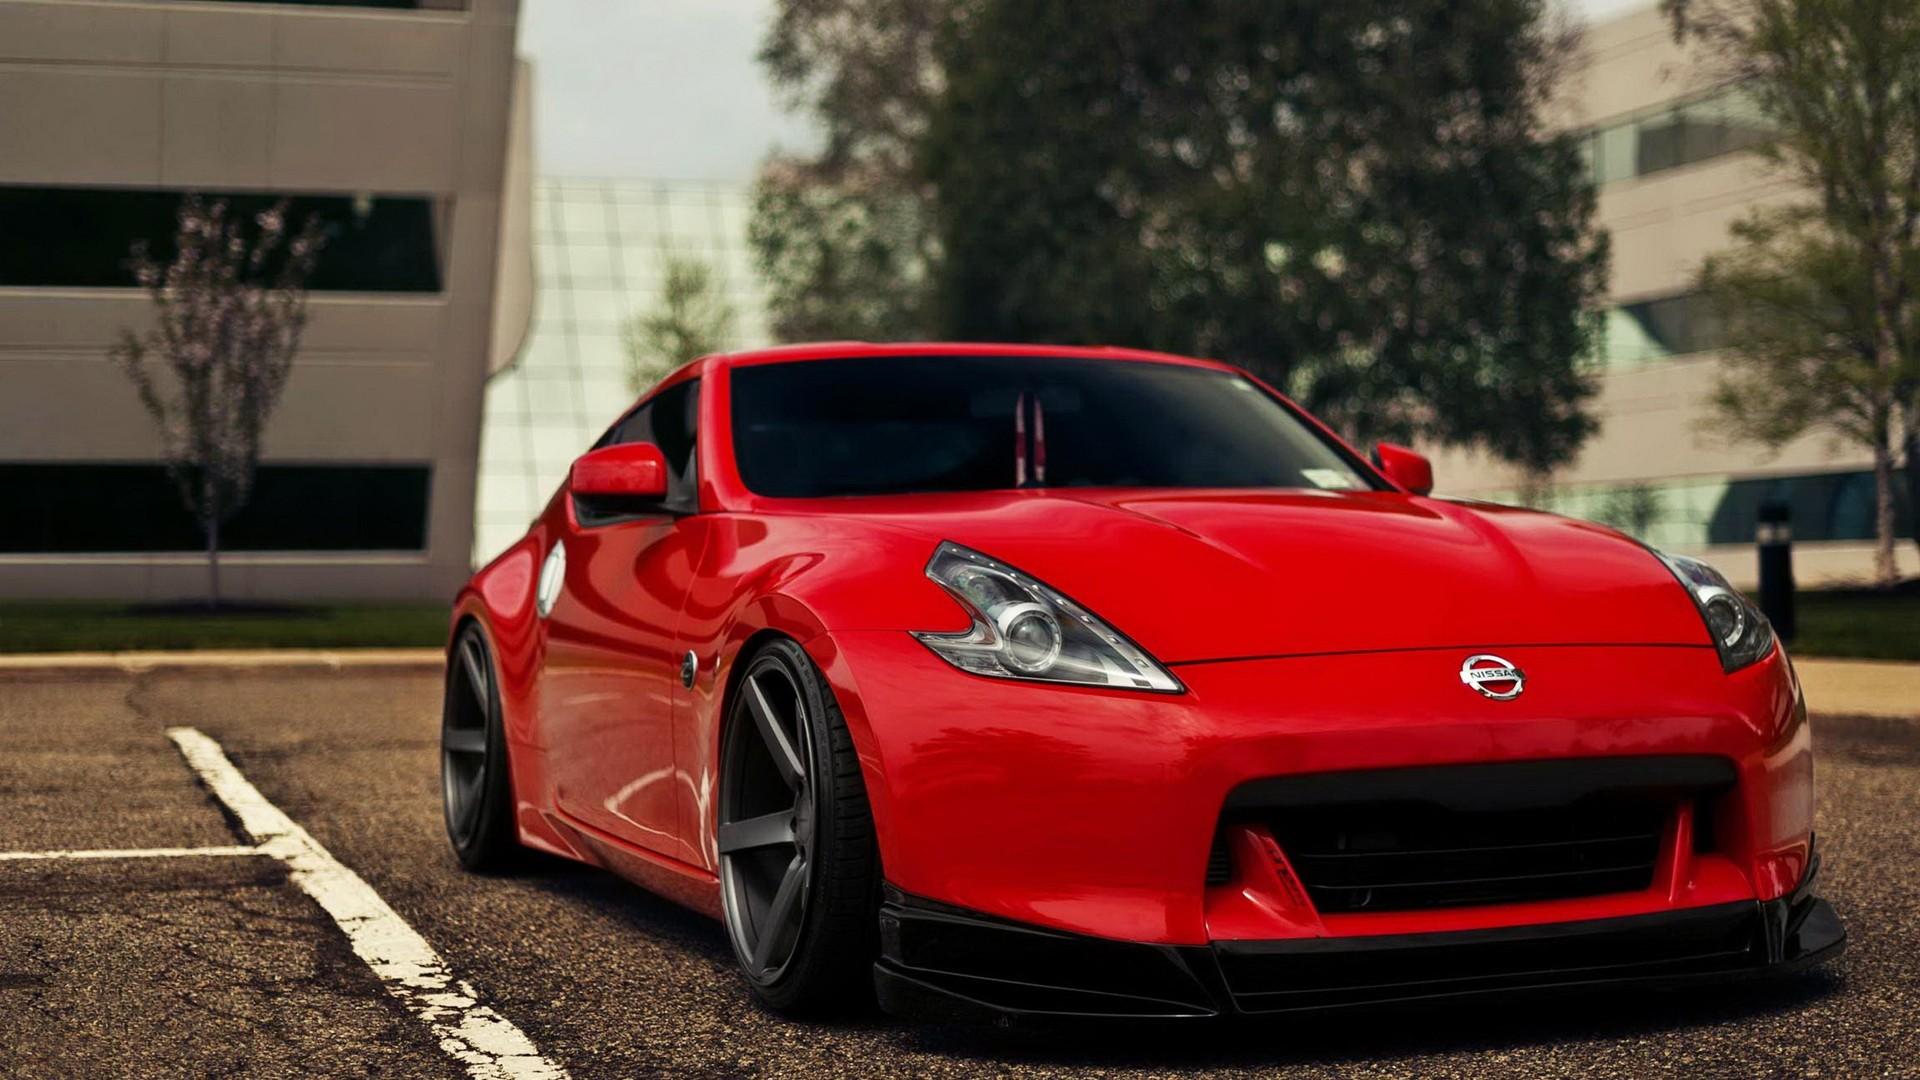 red cars nissan parking lot nissan fairlady z34 370z